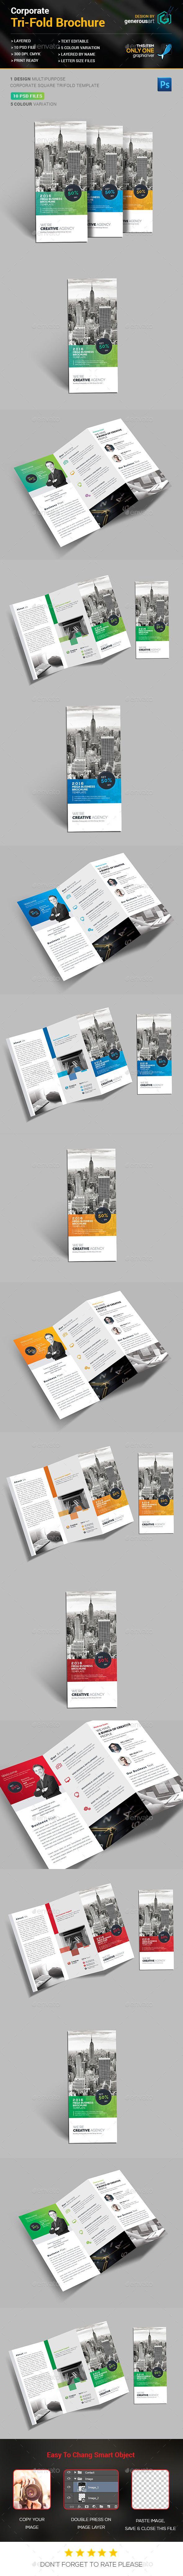 Tri-Fold Brochure Template PSD #design Download: http://graphicriver.net/item/trifold-brochure/14036264?ref=ksioks